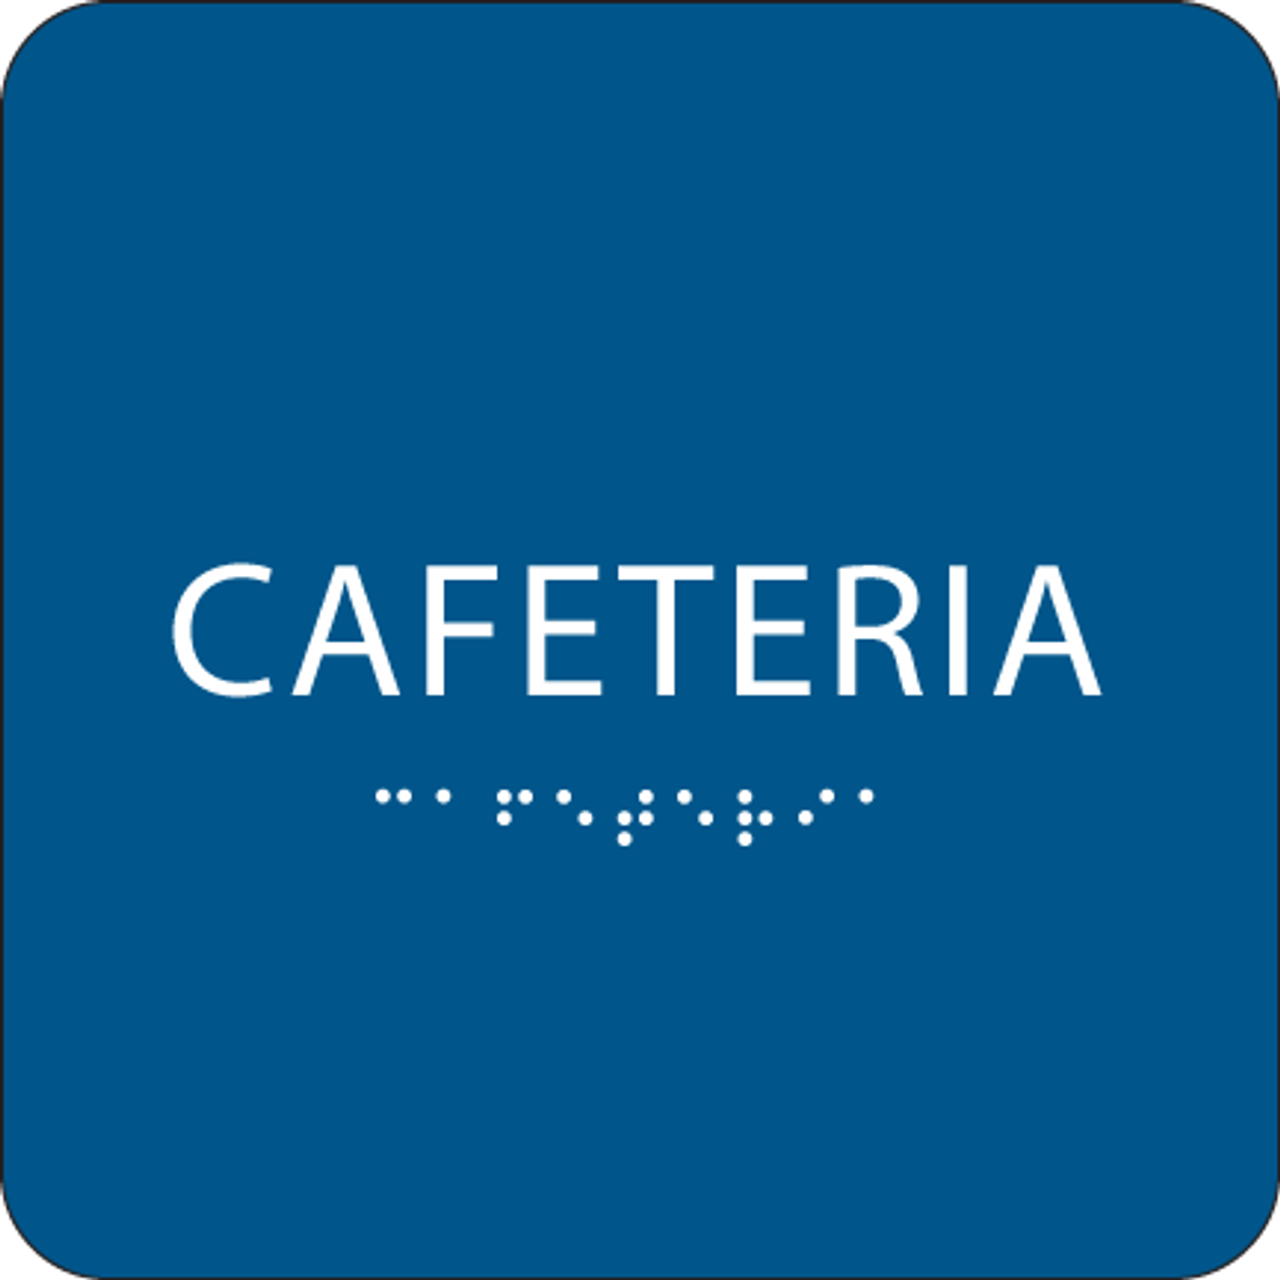 Blue Cafeteria ADA Sign